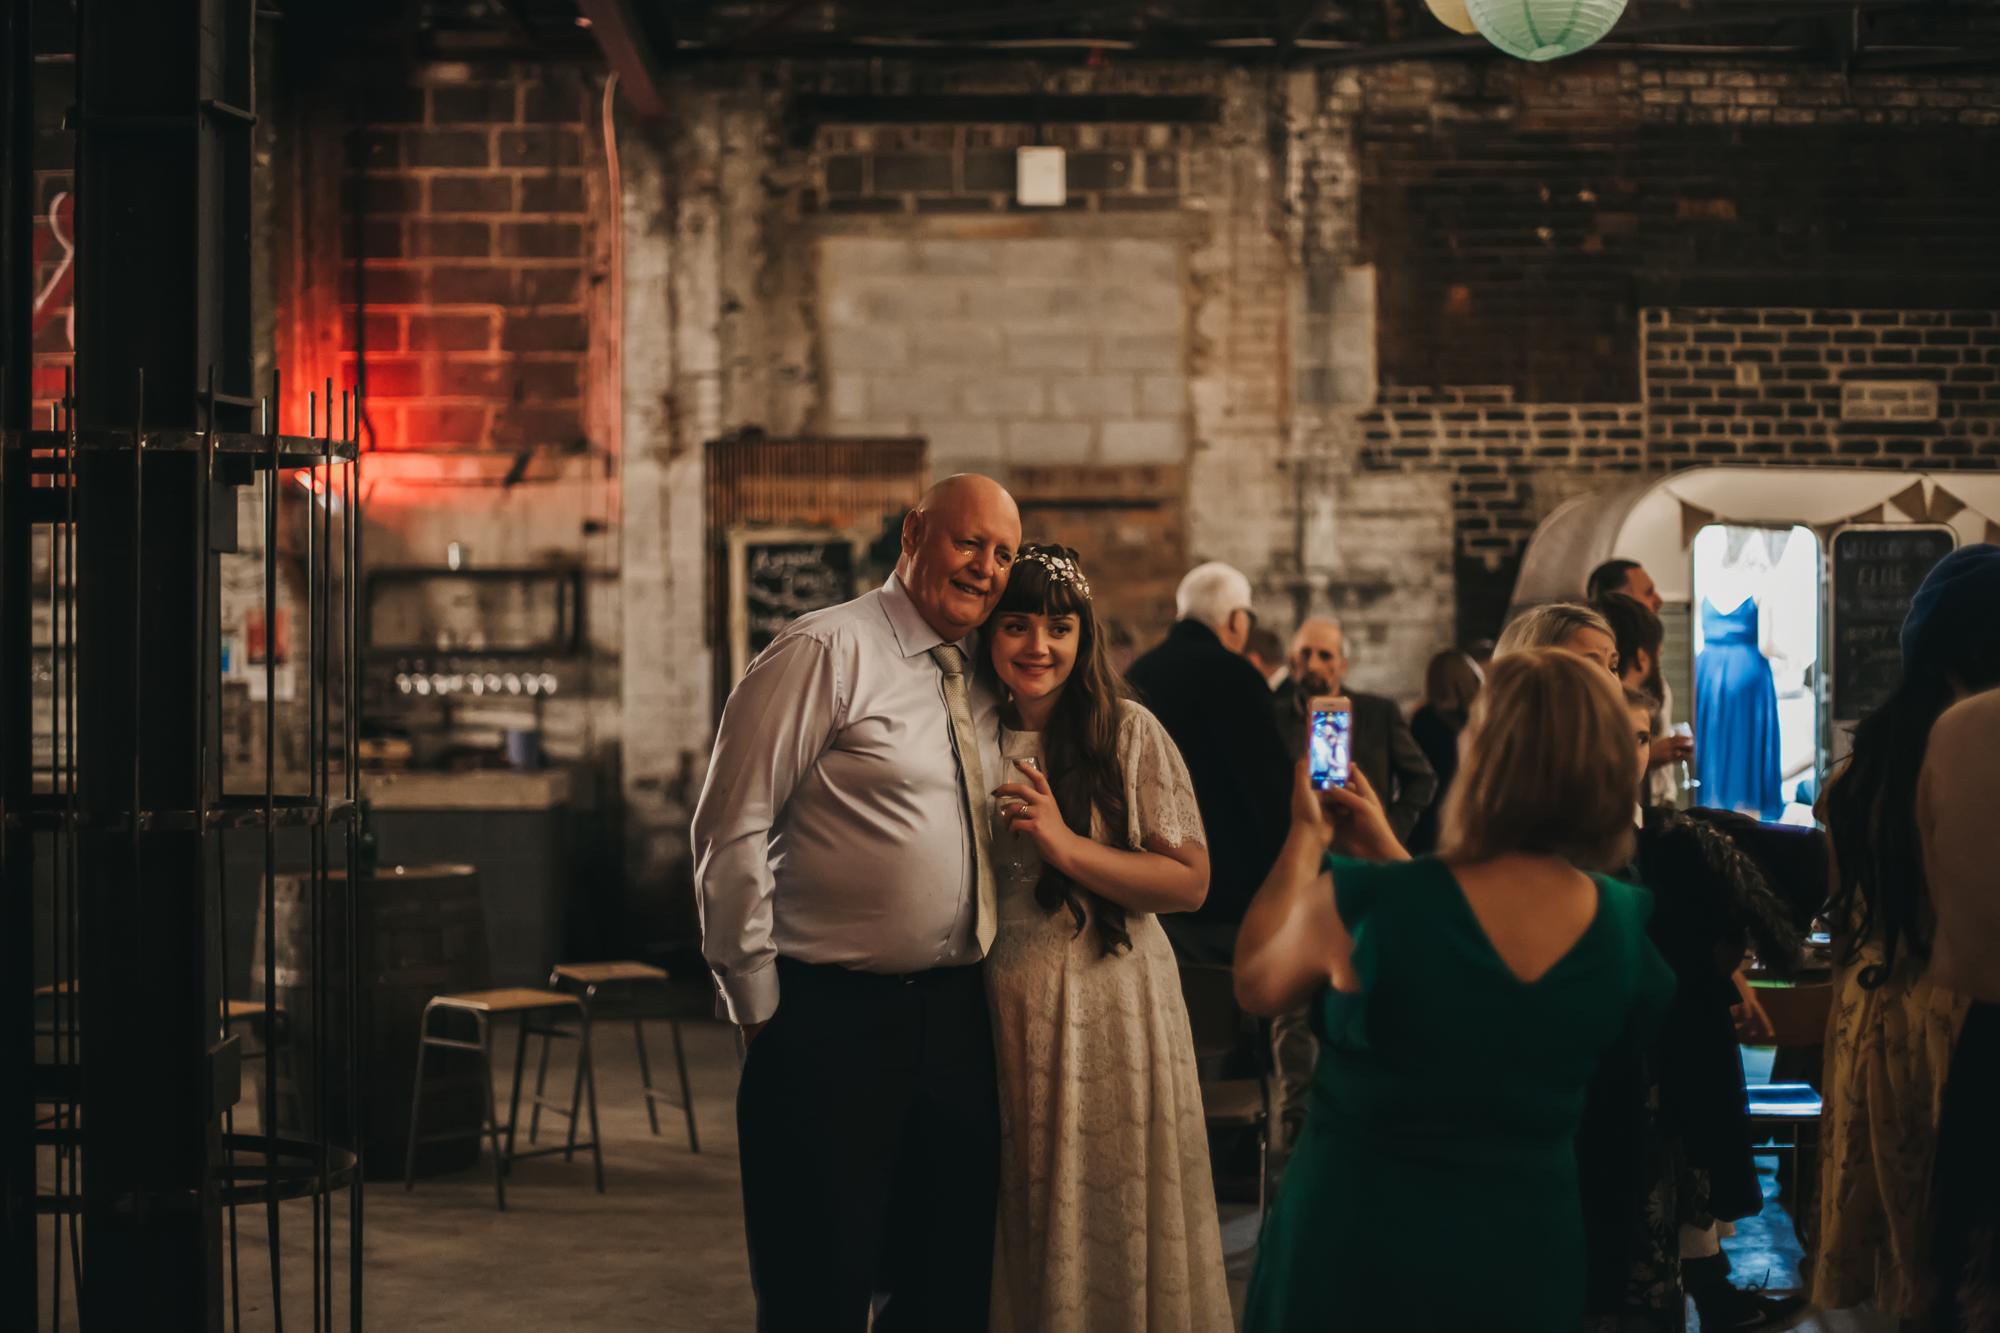 Kristy-Back-Garden-Outdoor-Wedding-Sheffield-Industrial-Warehouse-Wedding-Bohemian-Kate-Beaumont-Dahlia-Dress-56.jpg